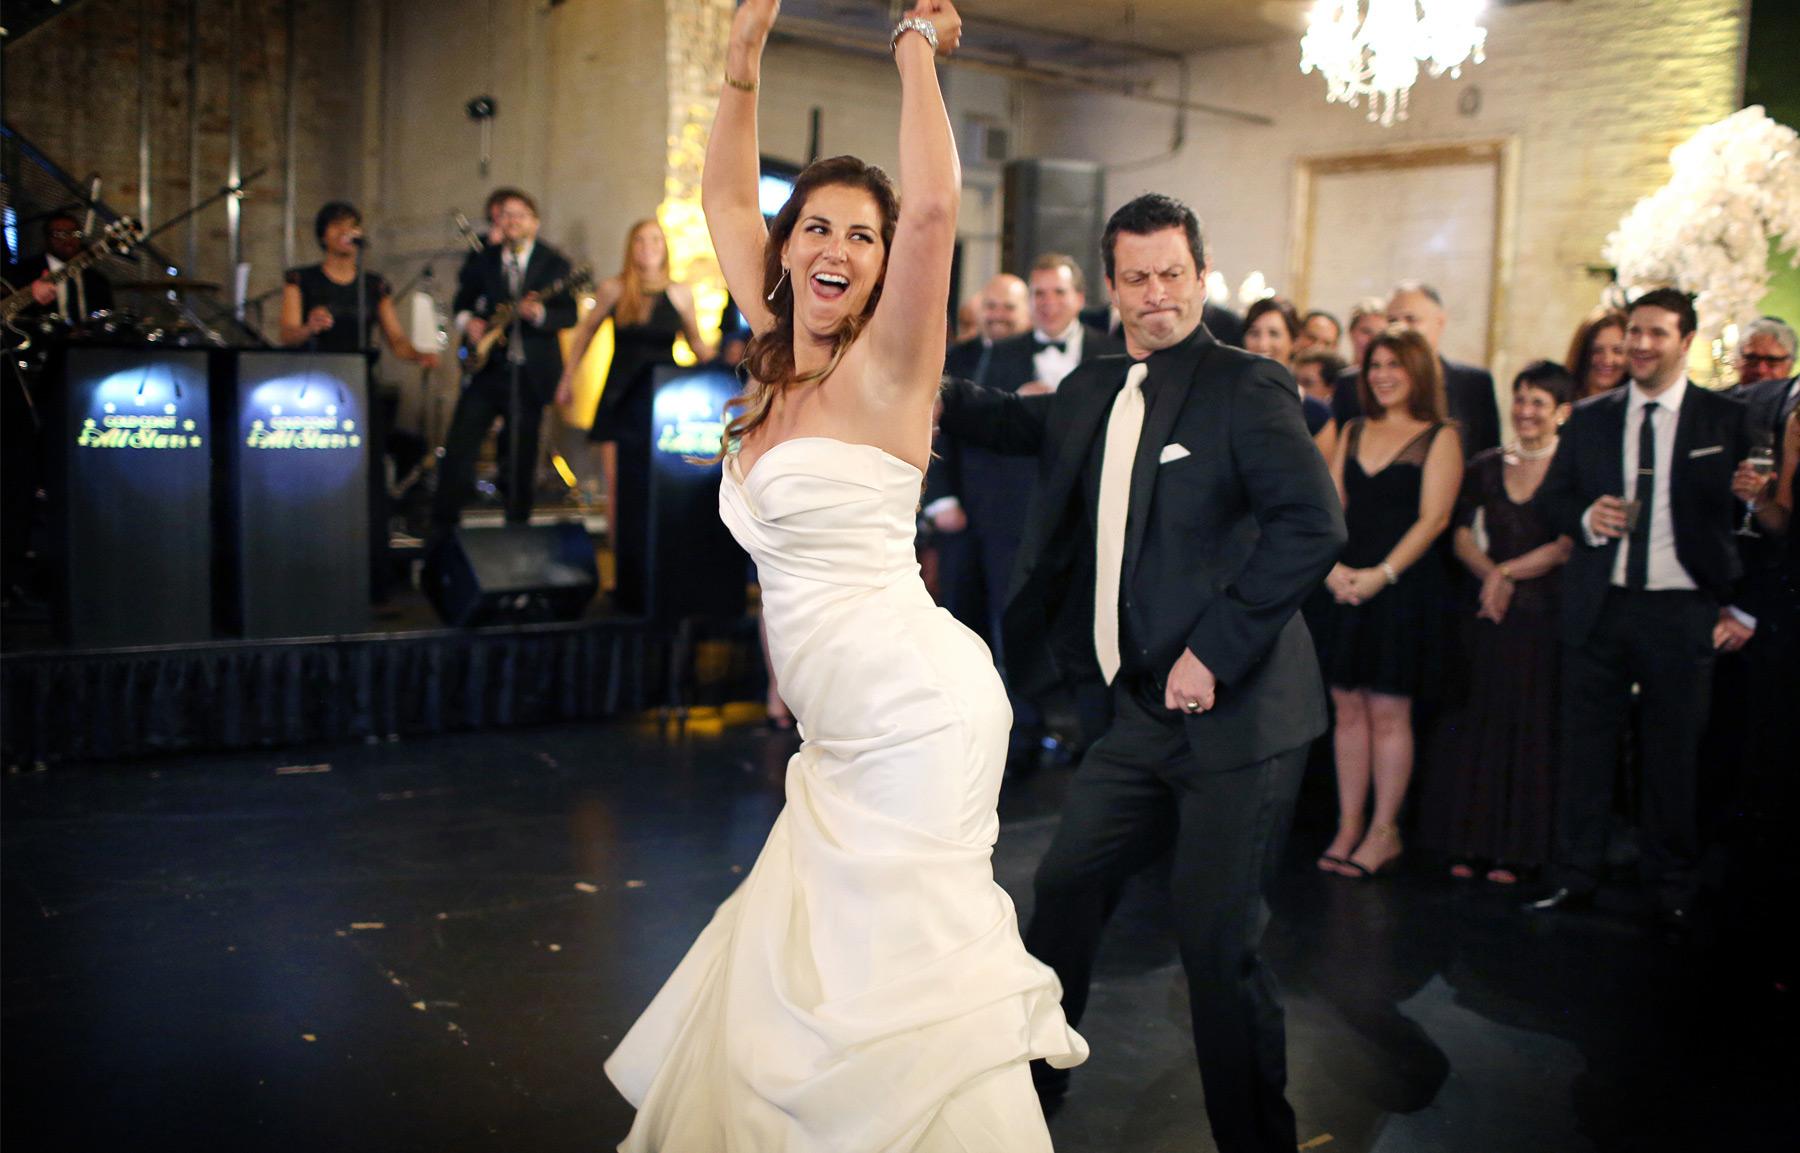 15-Minneapolis-Minnesota-Wedding-Photography-by-Vick-Photography-Aria-Reception-First-Dance-Layne-&-Dan.jpg